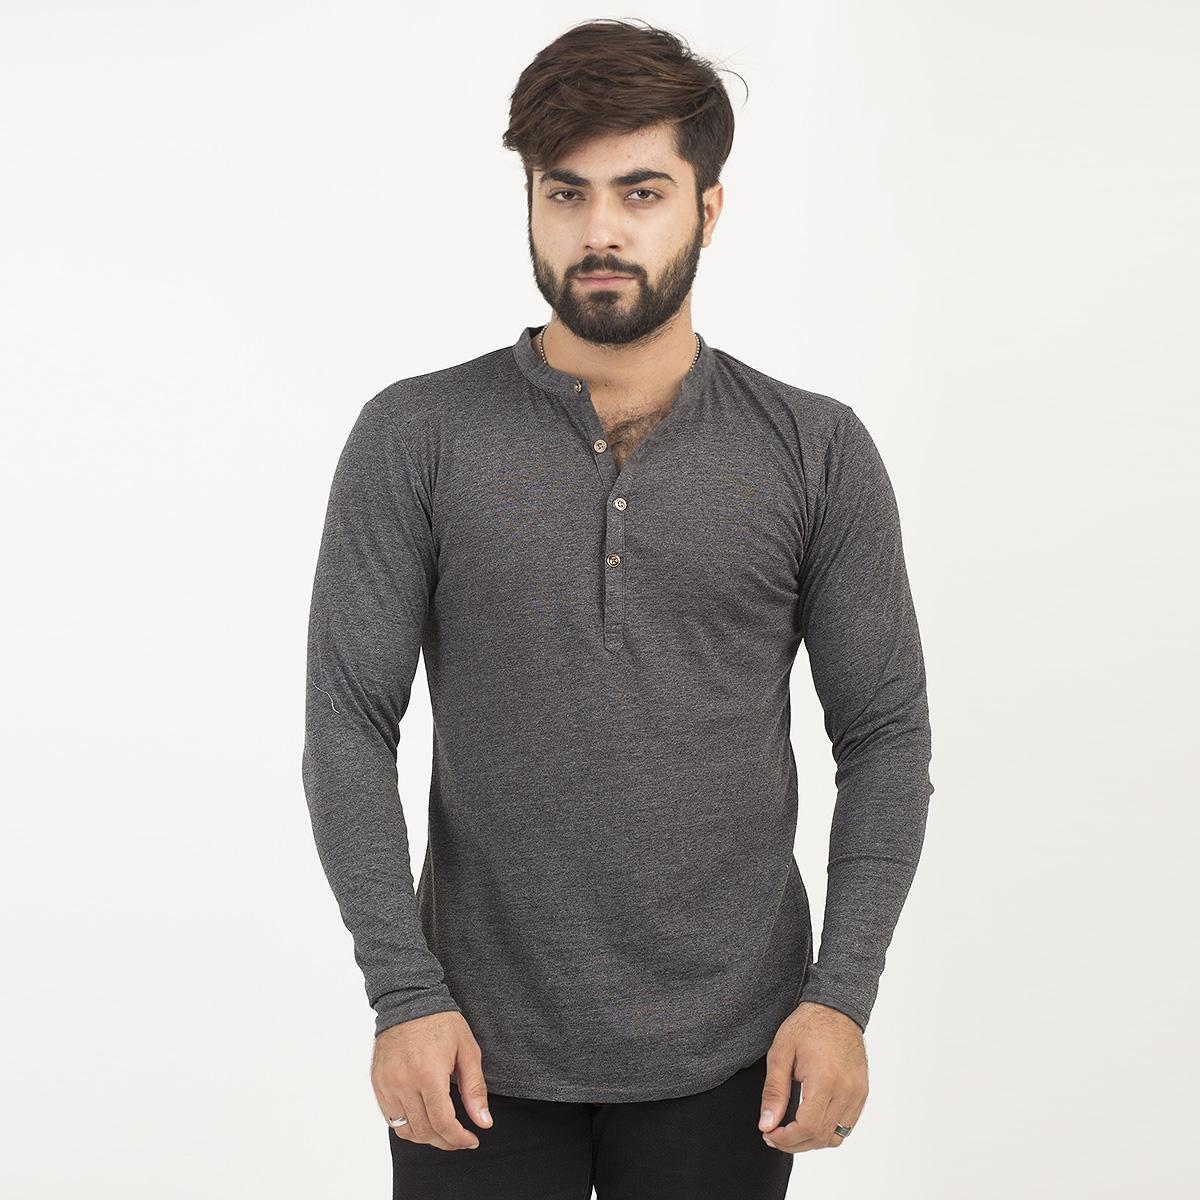 Full Sleeves Plain Charcoal Kurti Style Tshirt For Men